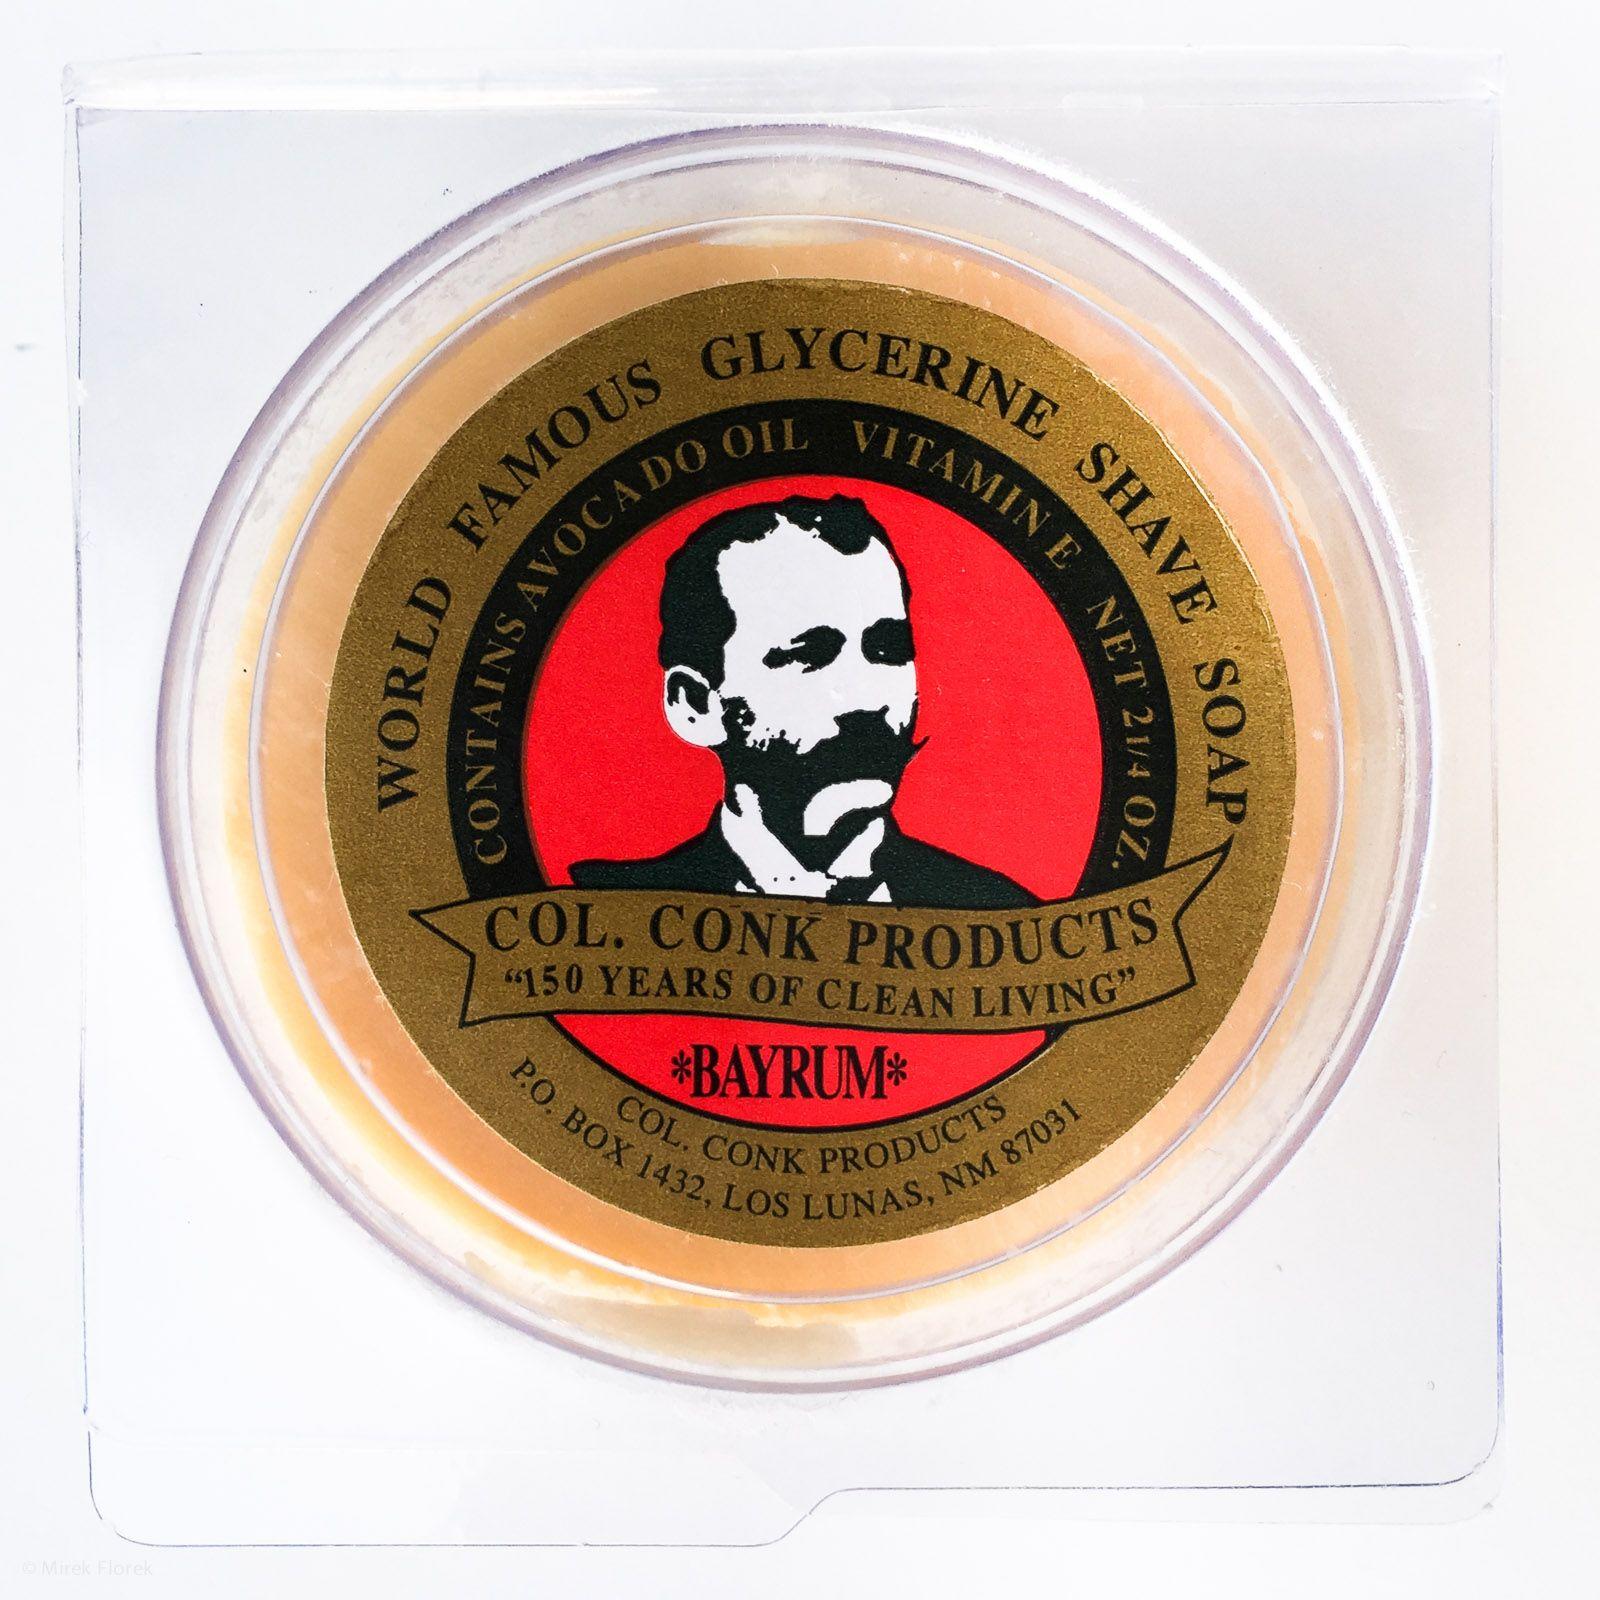 Opakowanie mydła do golenia Col. Conk Shave Soap Bay Rum